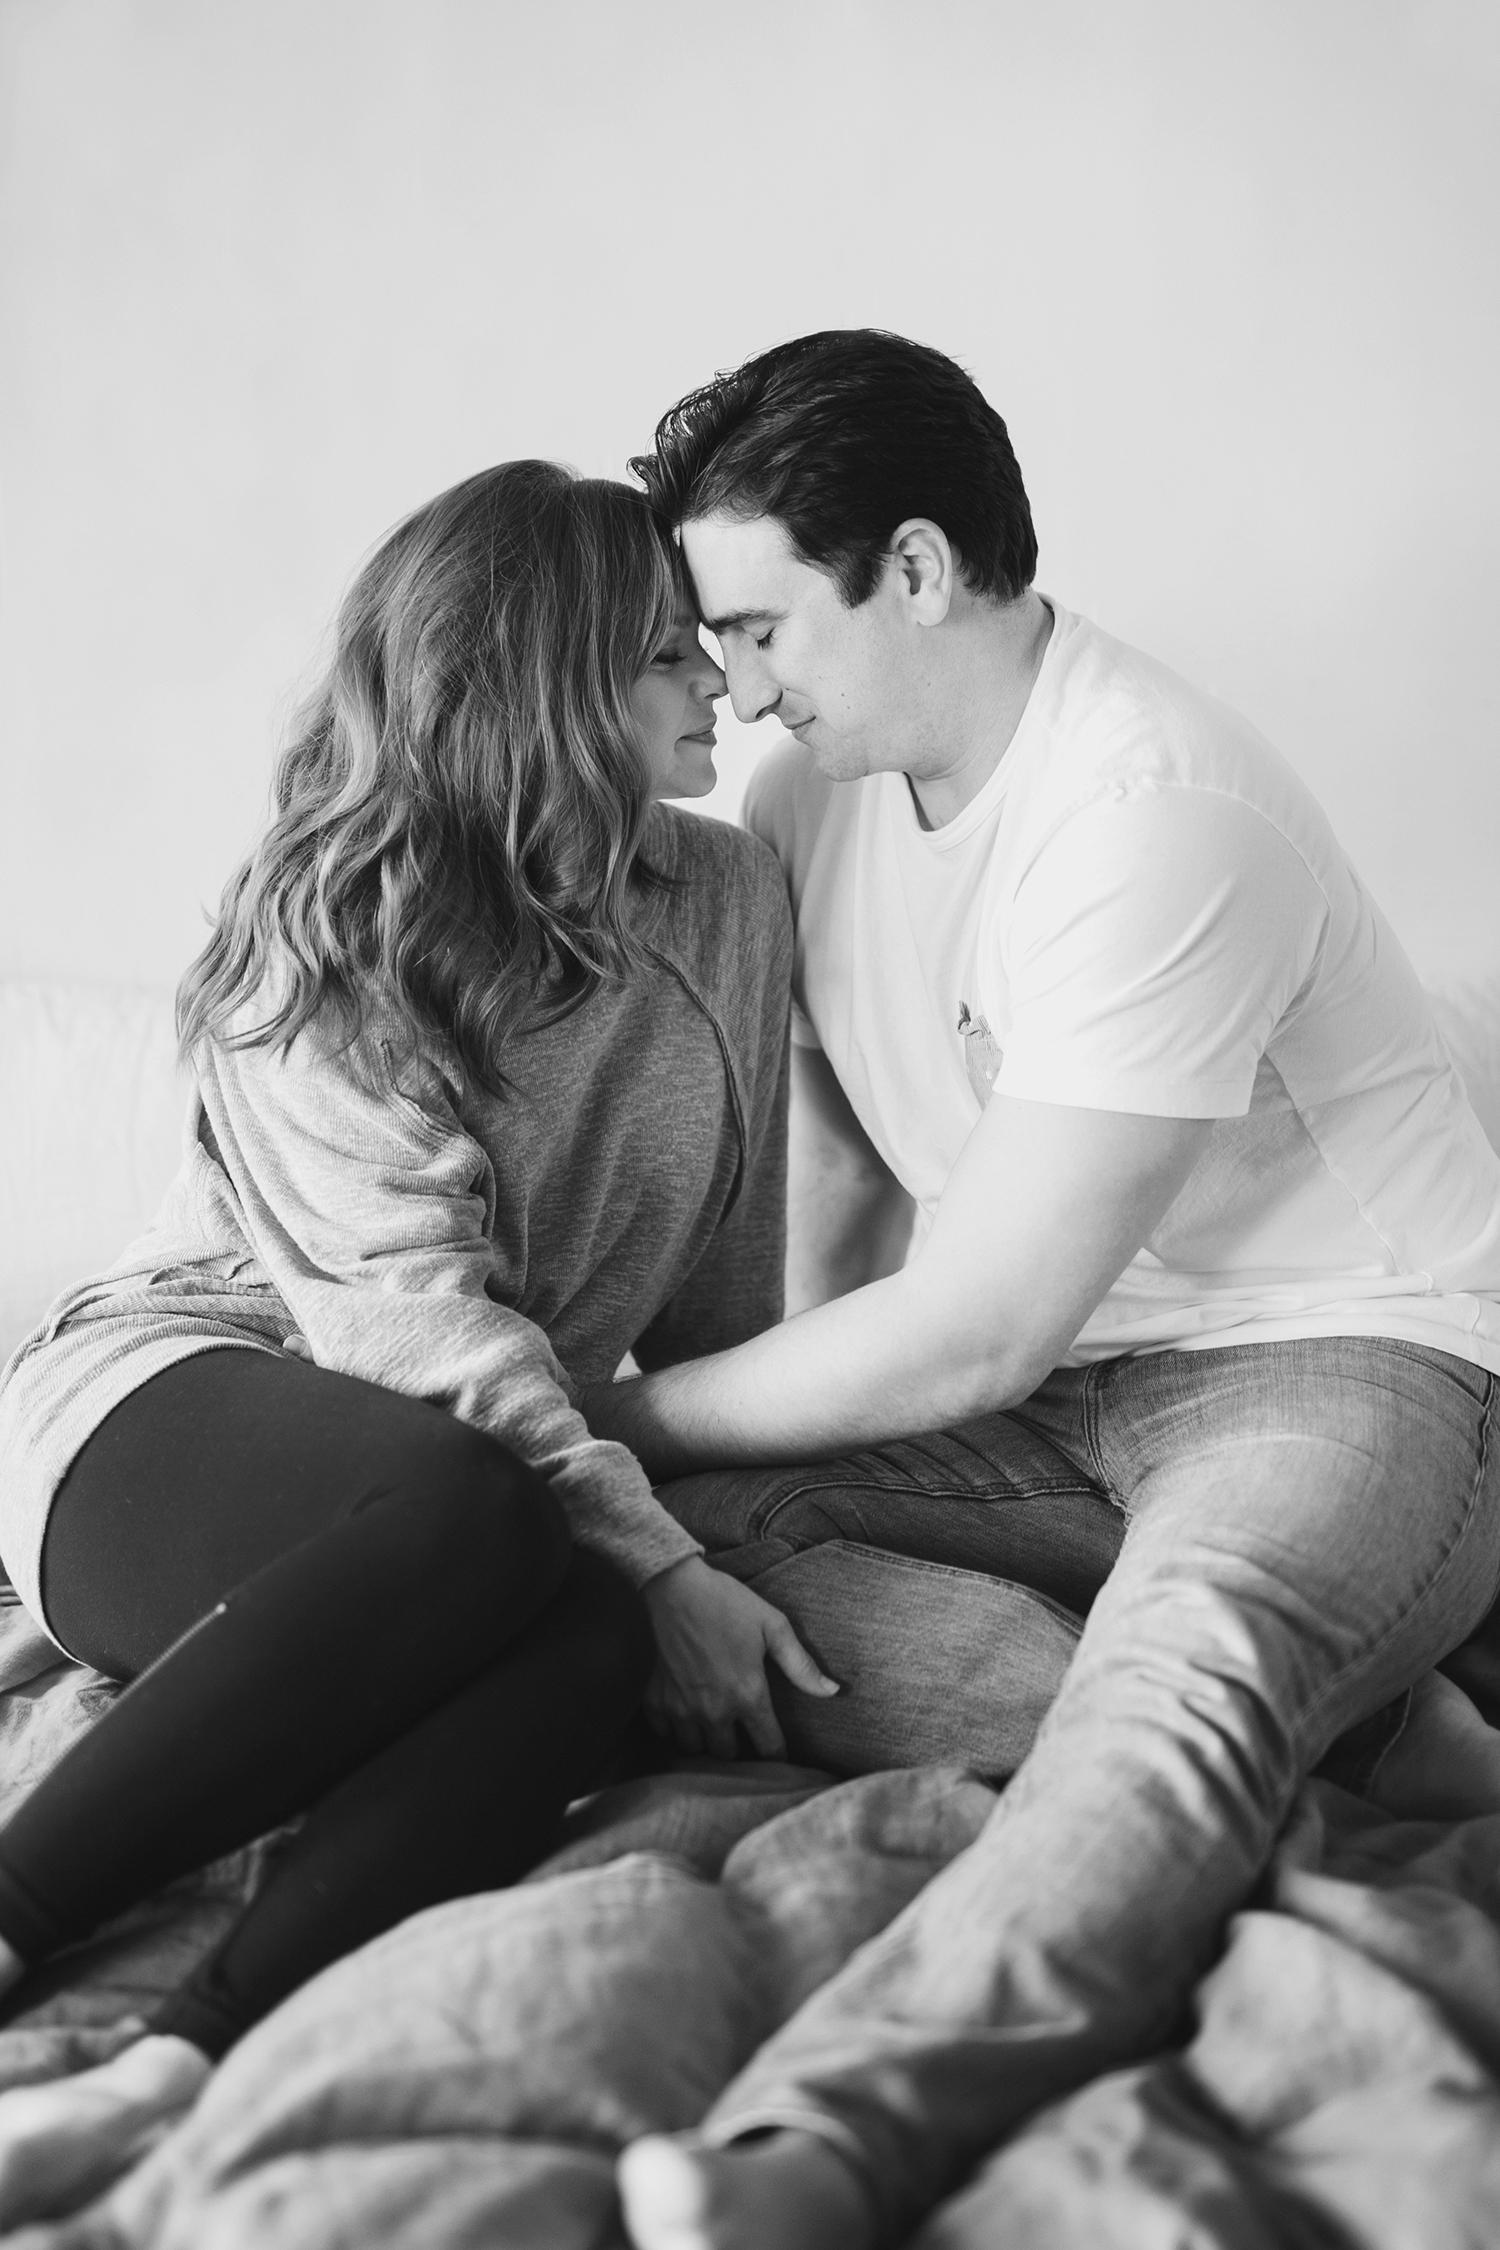 austin-birth-pregnany-baby-photographer-026.jpg